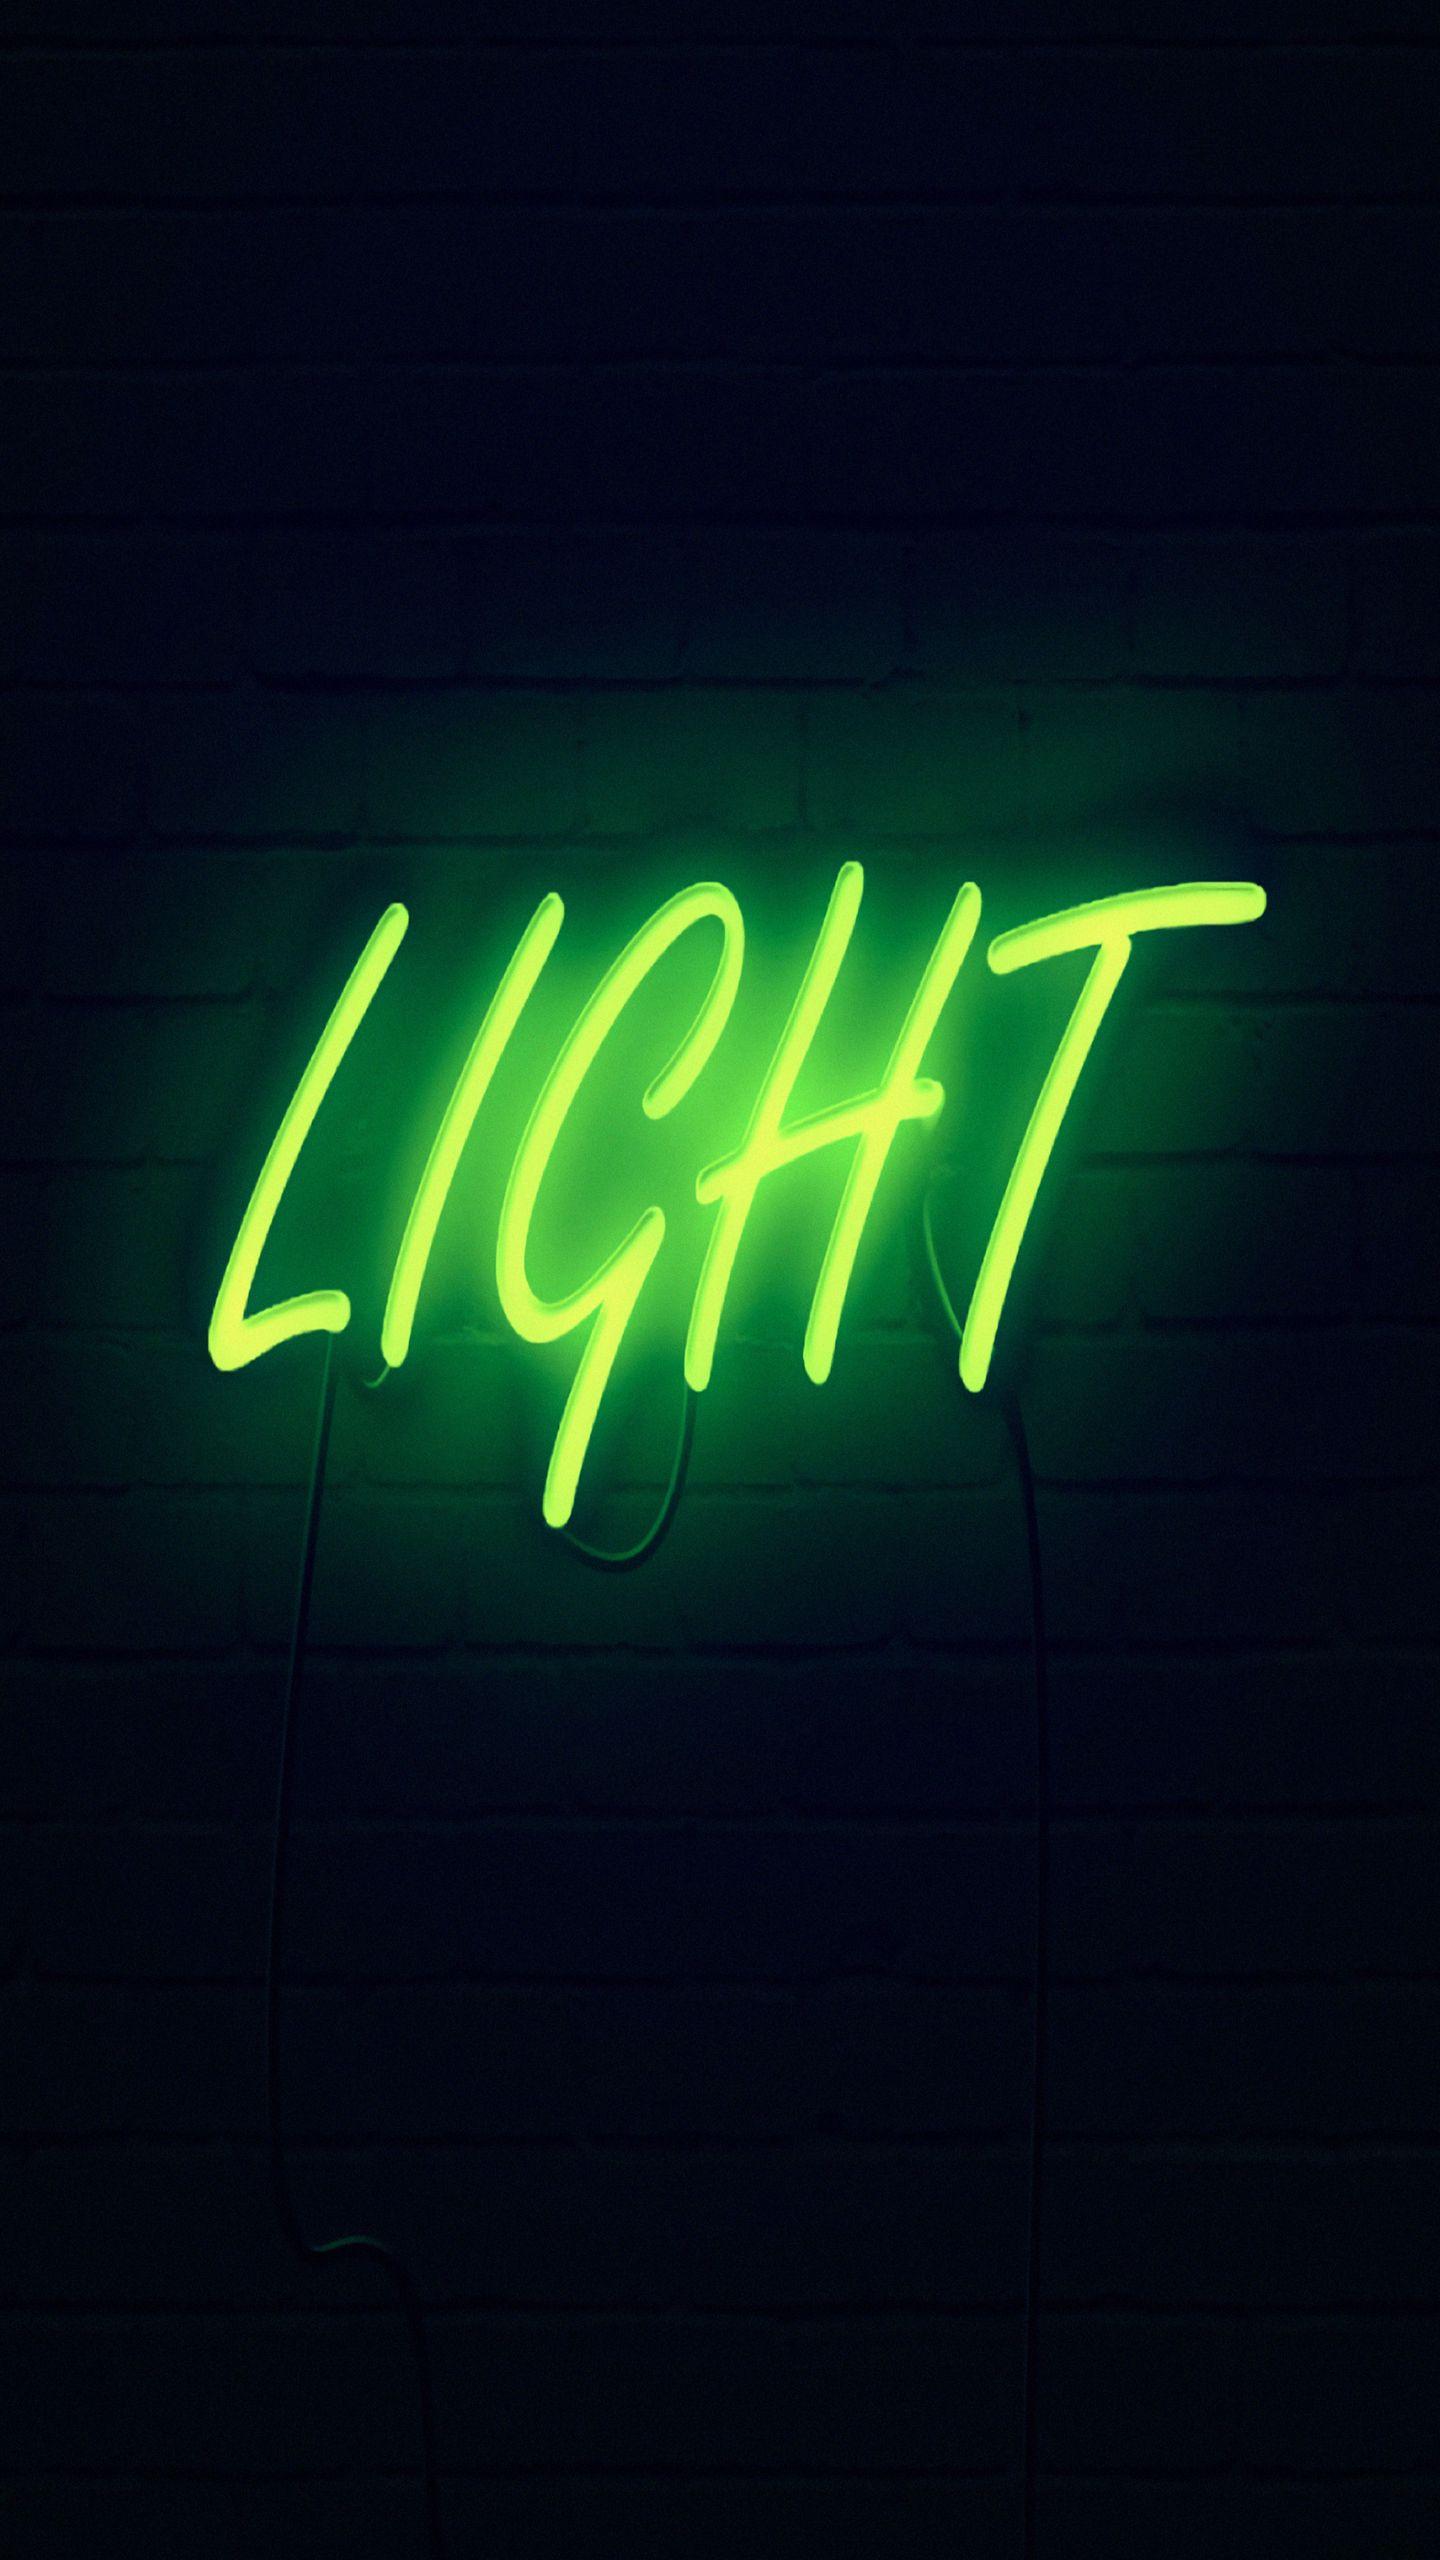 1440x2560 Wallpaper light, neon, inscription, dark, yellow